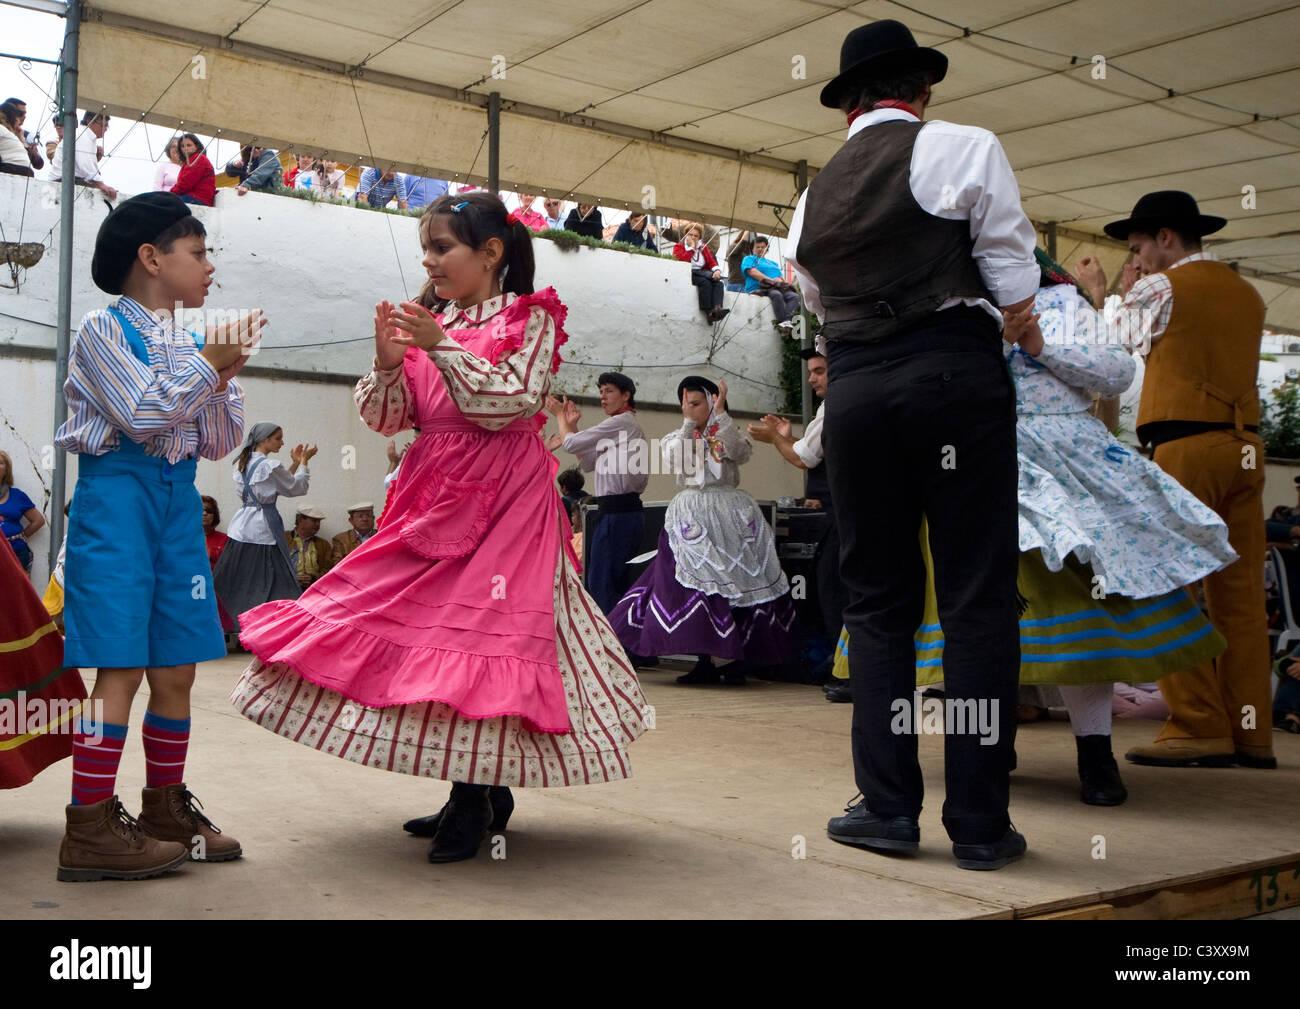 Children dancing during the annual Sardine Festival in Alcoutim Algarve Portugal - Stock Image